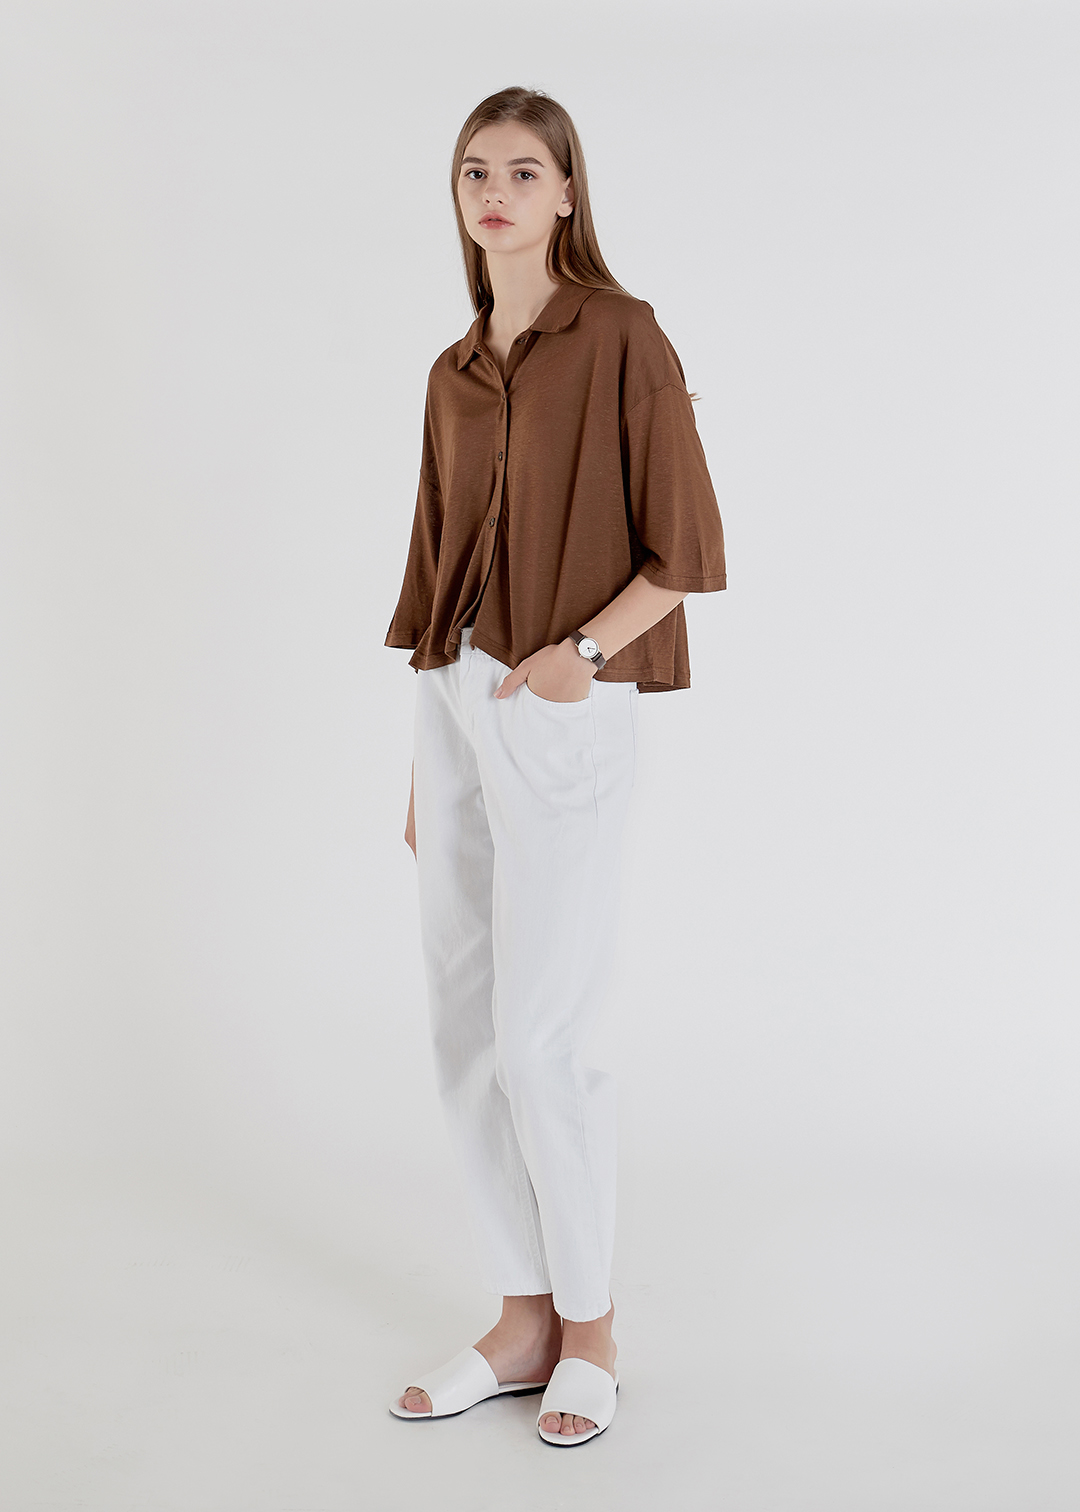 Loose Button Up Cotton Shirt